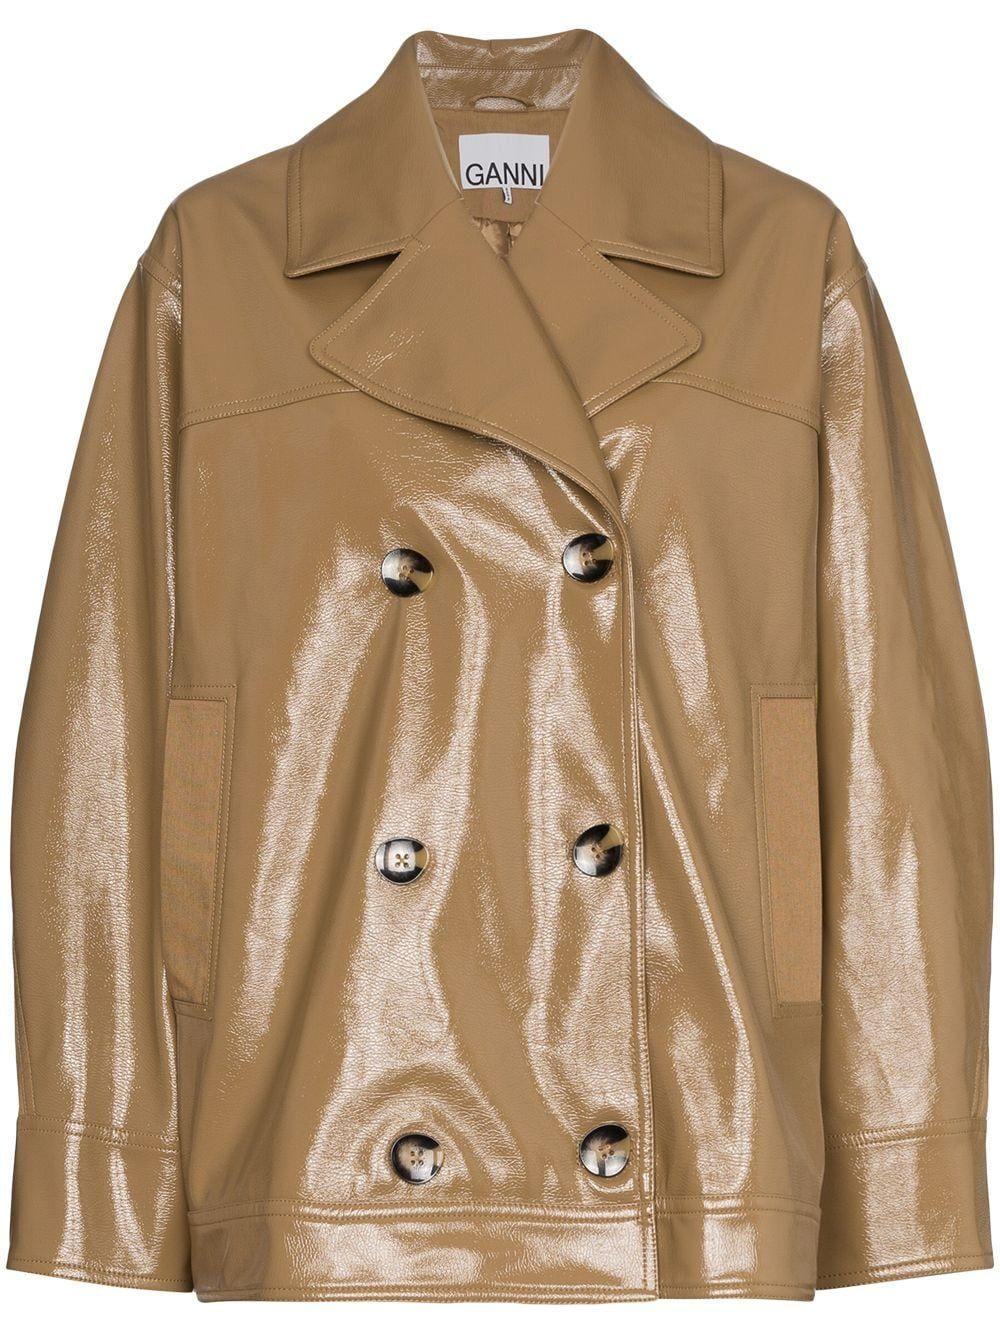 Ganni Boxy Fit Double Breasted Jacket Farfetch Double Breasted Jacket Double Breasted Leather Jacket [ 1334 x 1000 Pixel ]